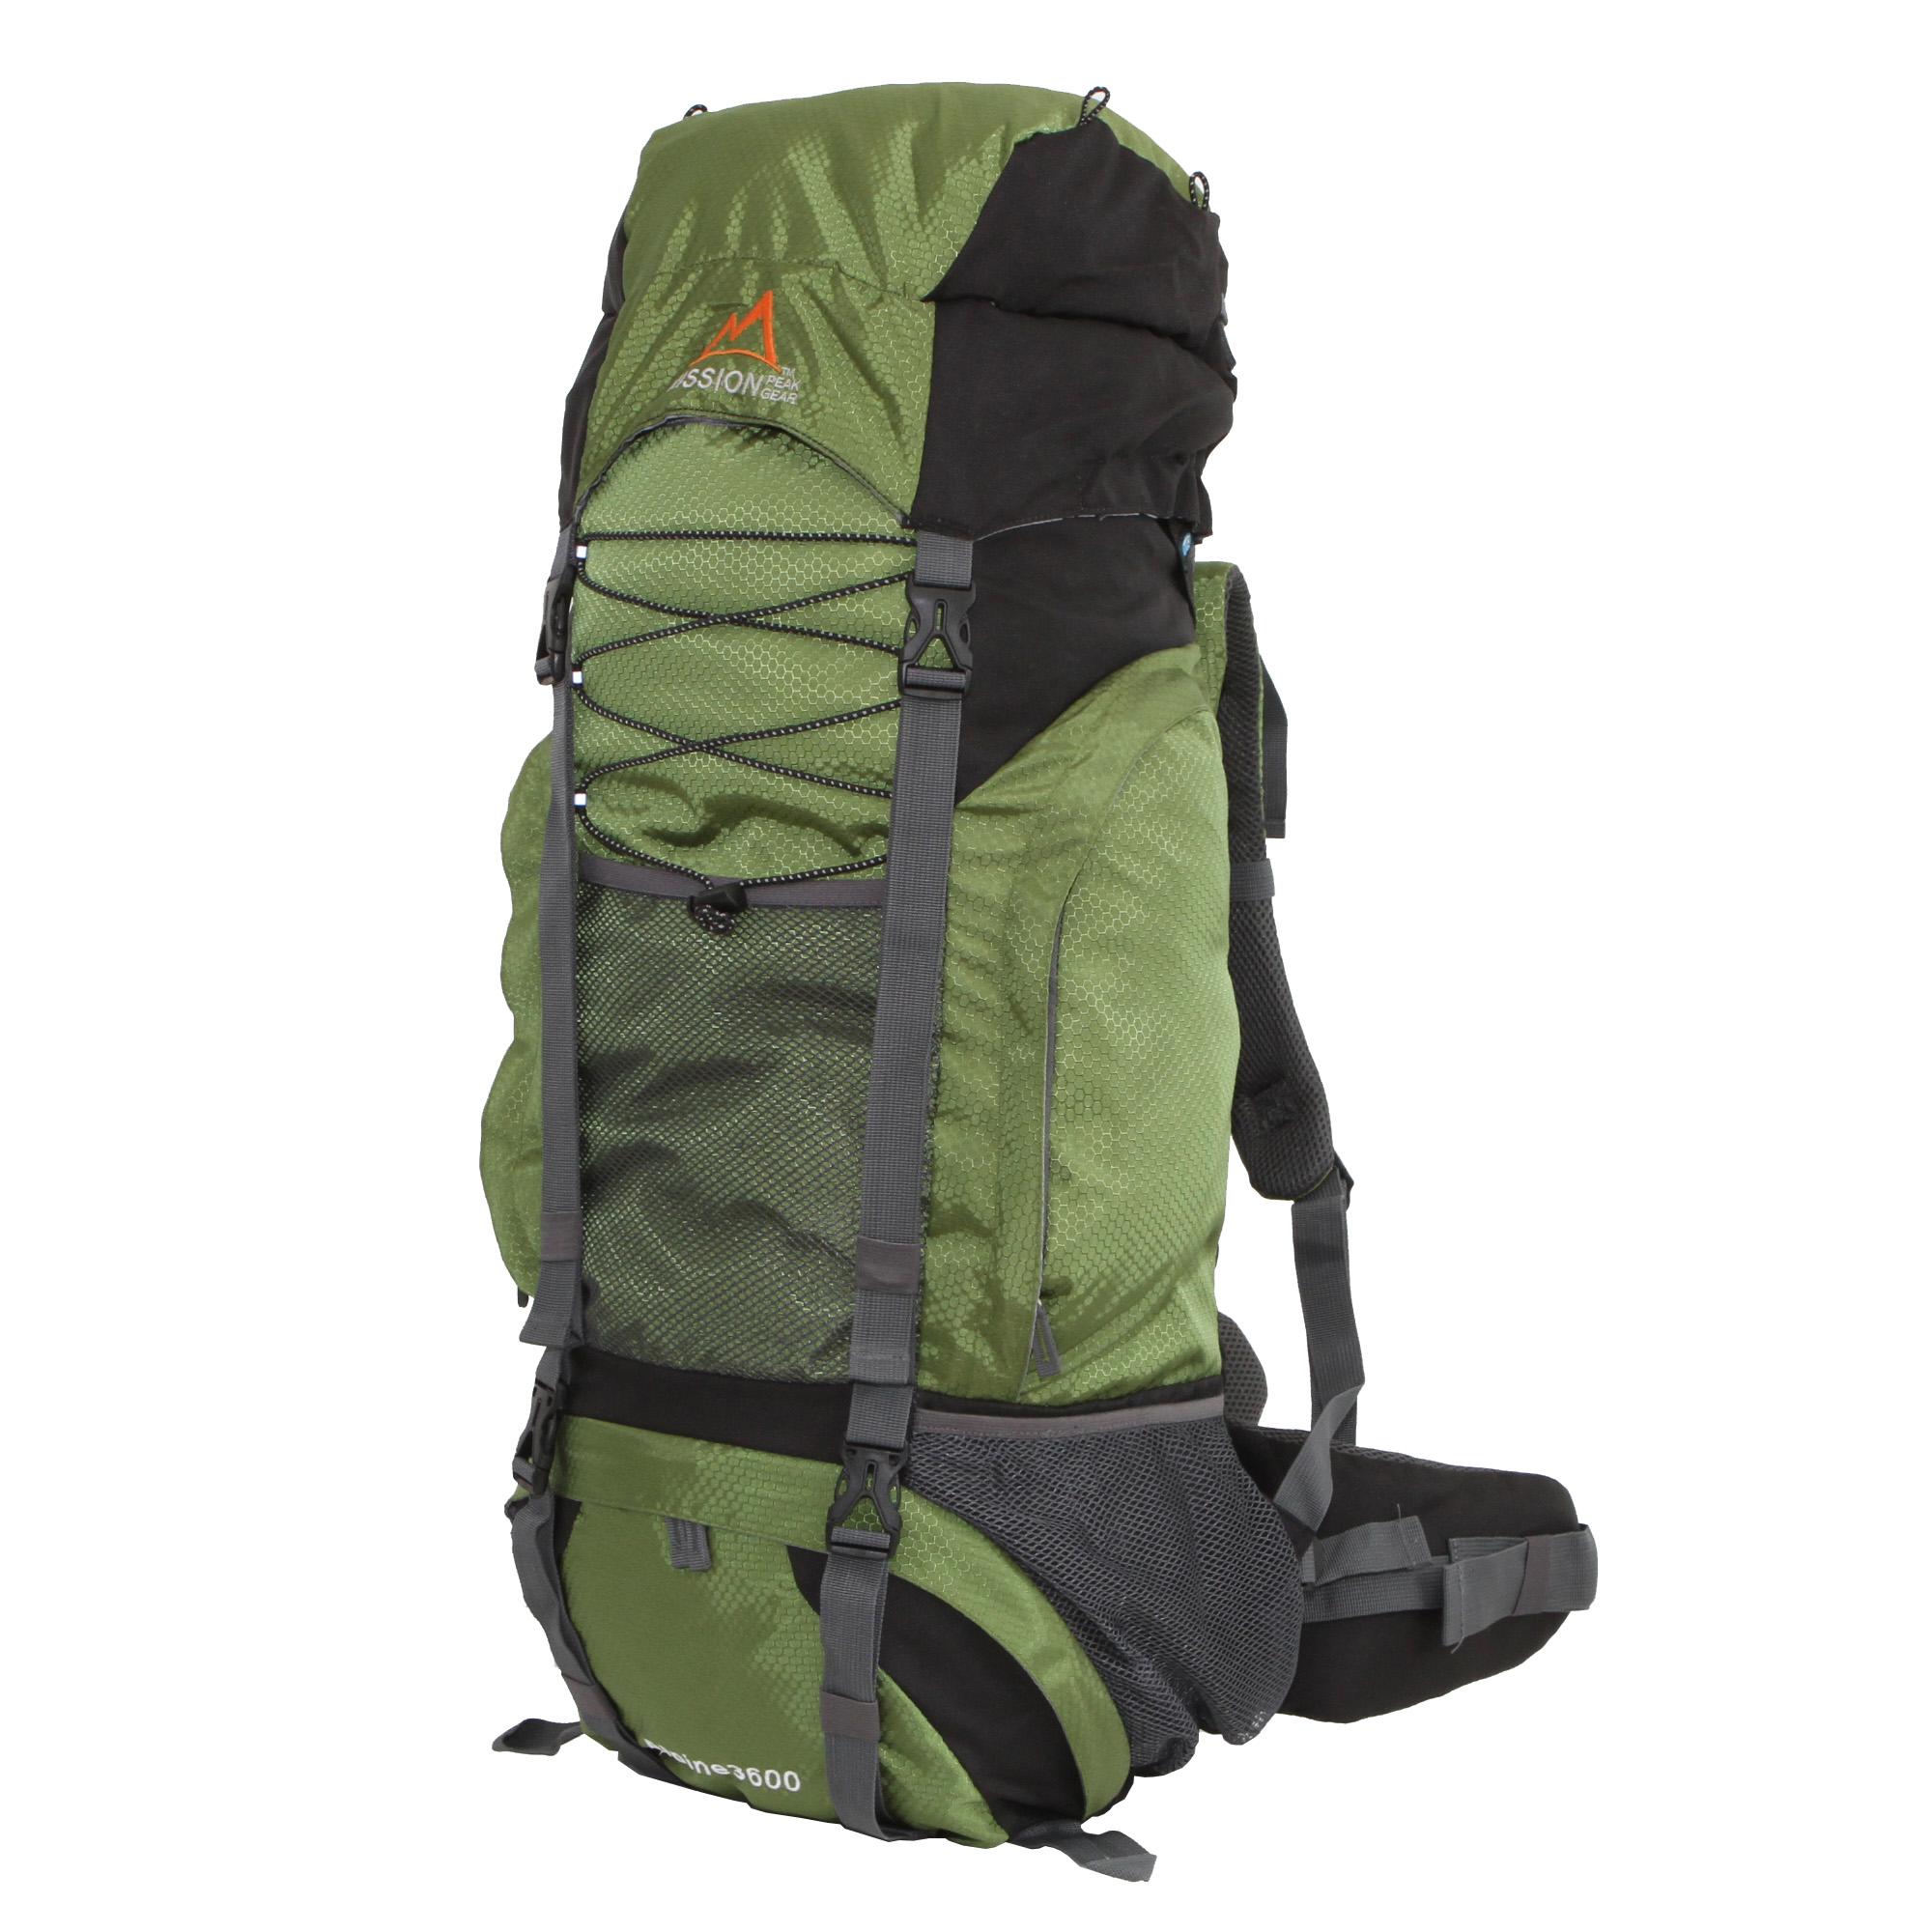 alpine3600-green